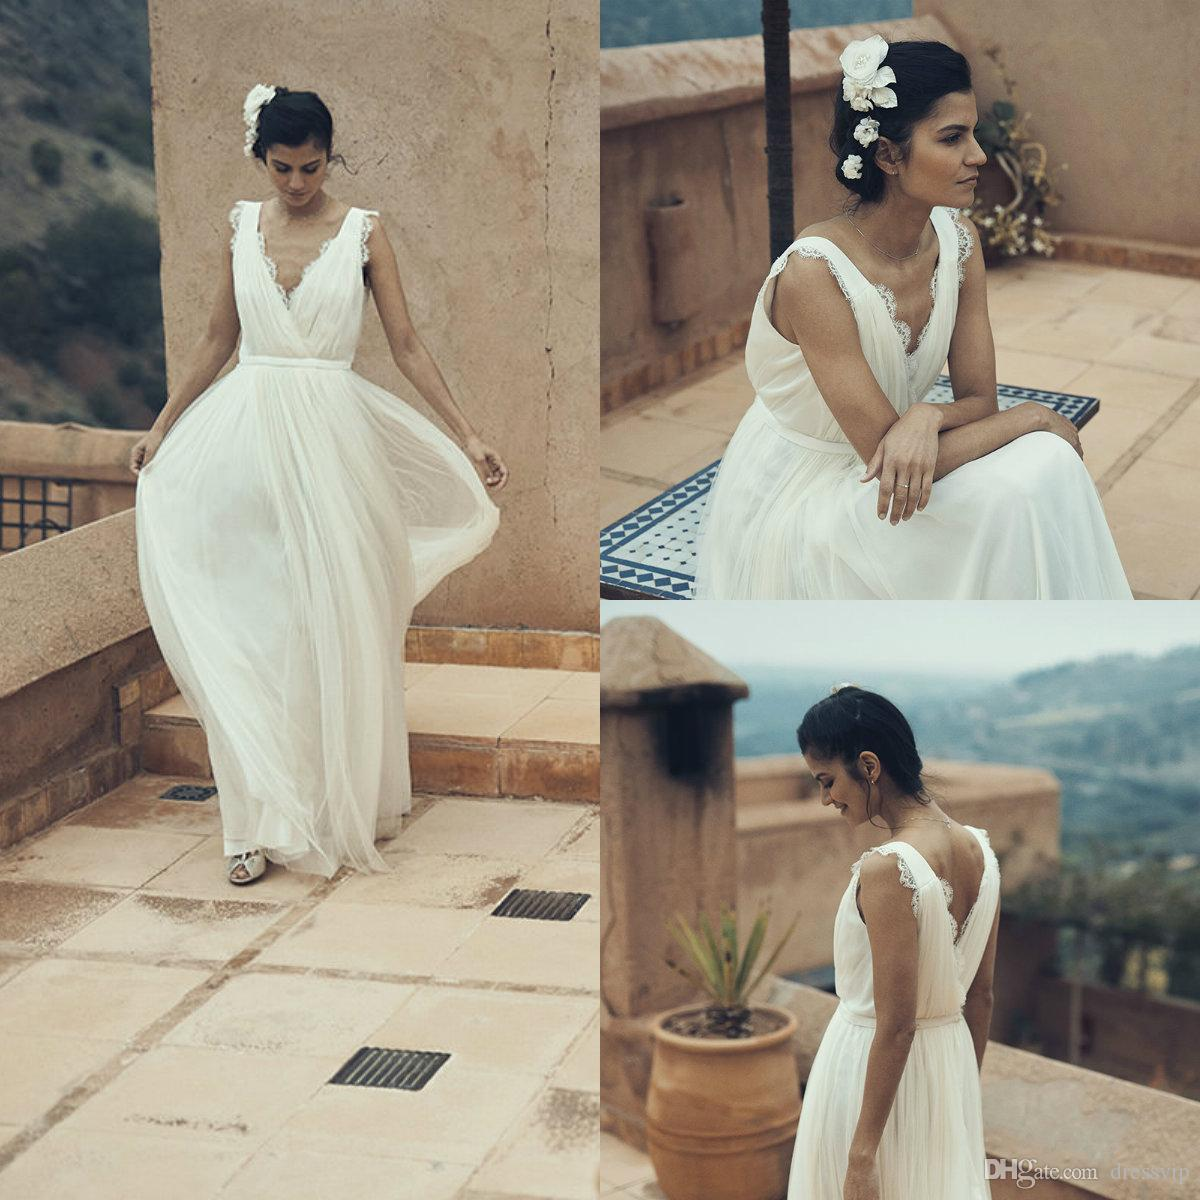 Discount Laure De Sagazan Vintage Wedding Dresses Deep V Neck Floor Length  Sash Tulle Lace Bridal Dress Custom Made Simple Country Robe De Mariée Plus  Size ... b5f1ee4faa63